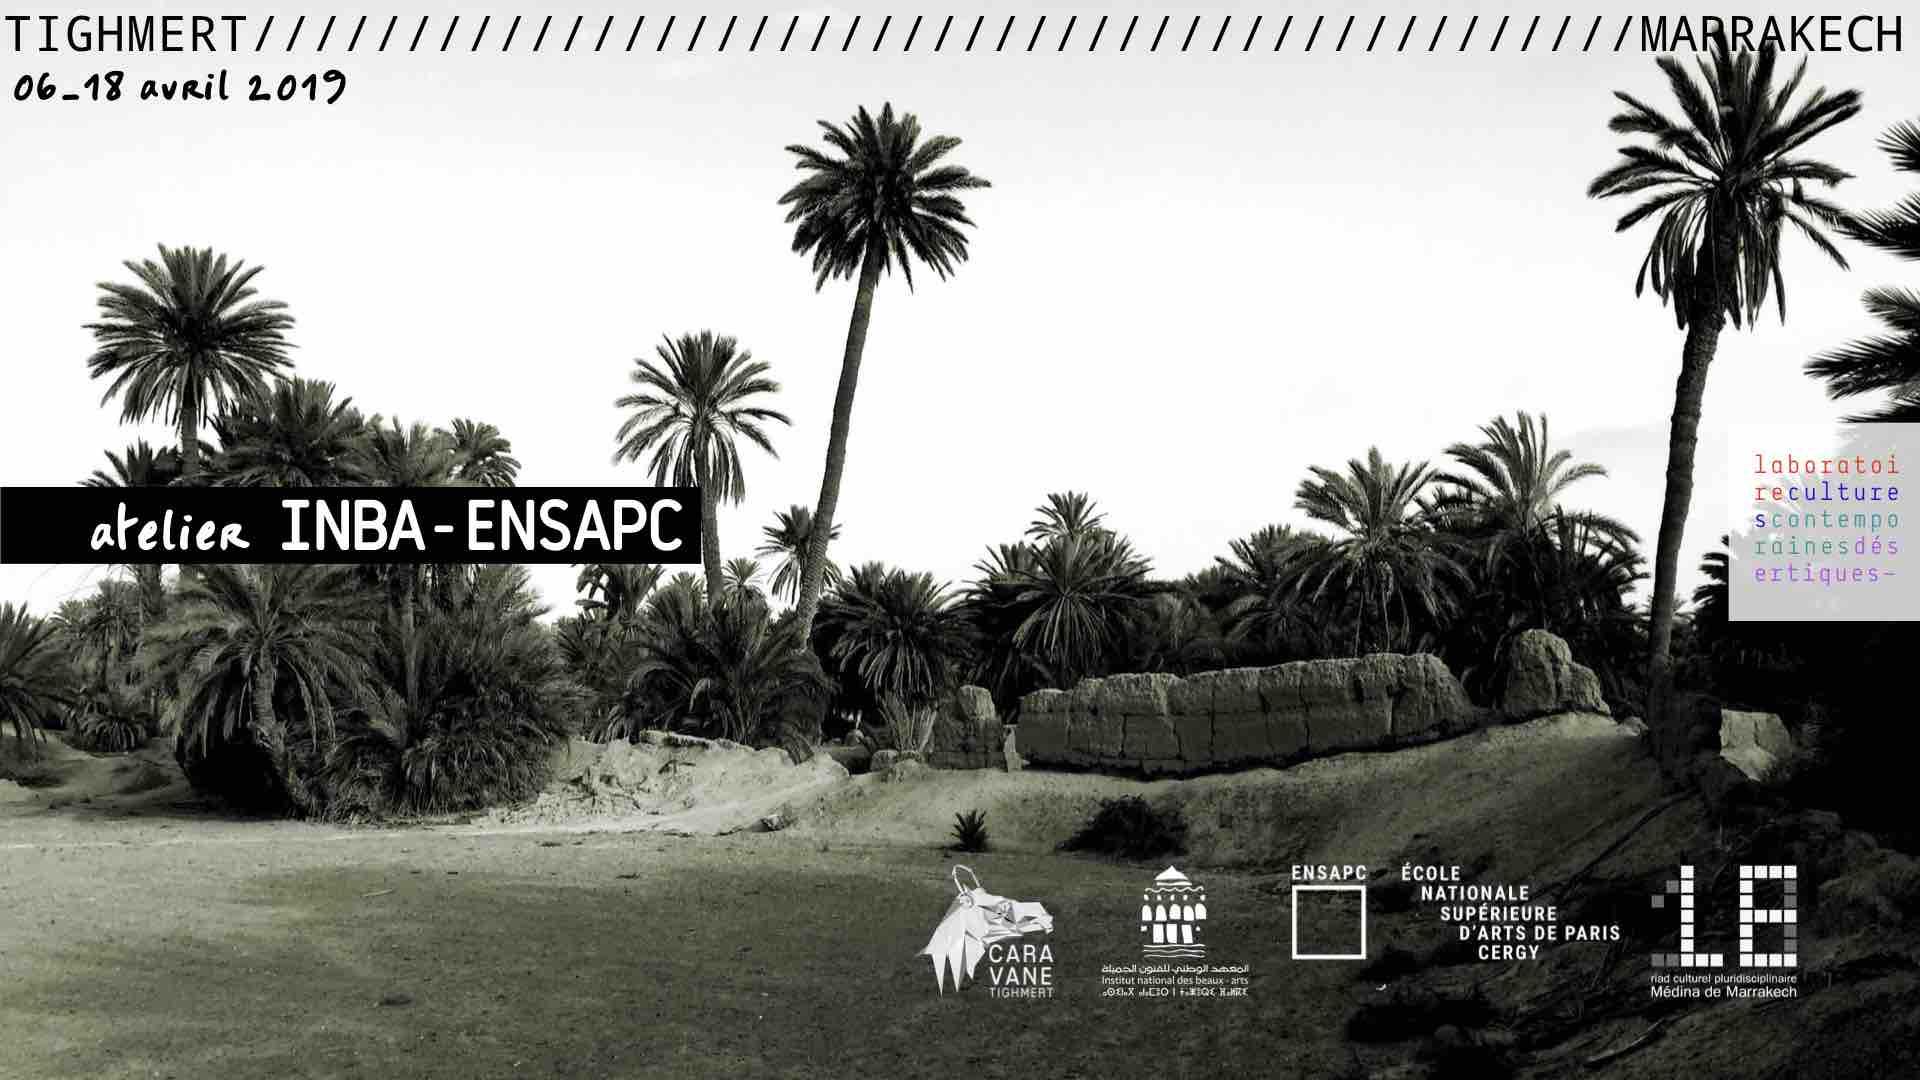 RETOUR DE TIGHMERT 2, INBA Tétouan (Maroc) 2019